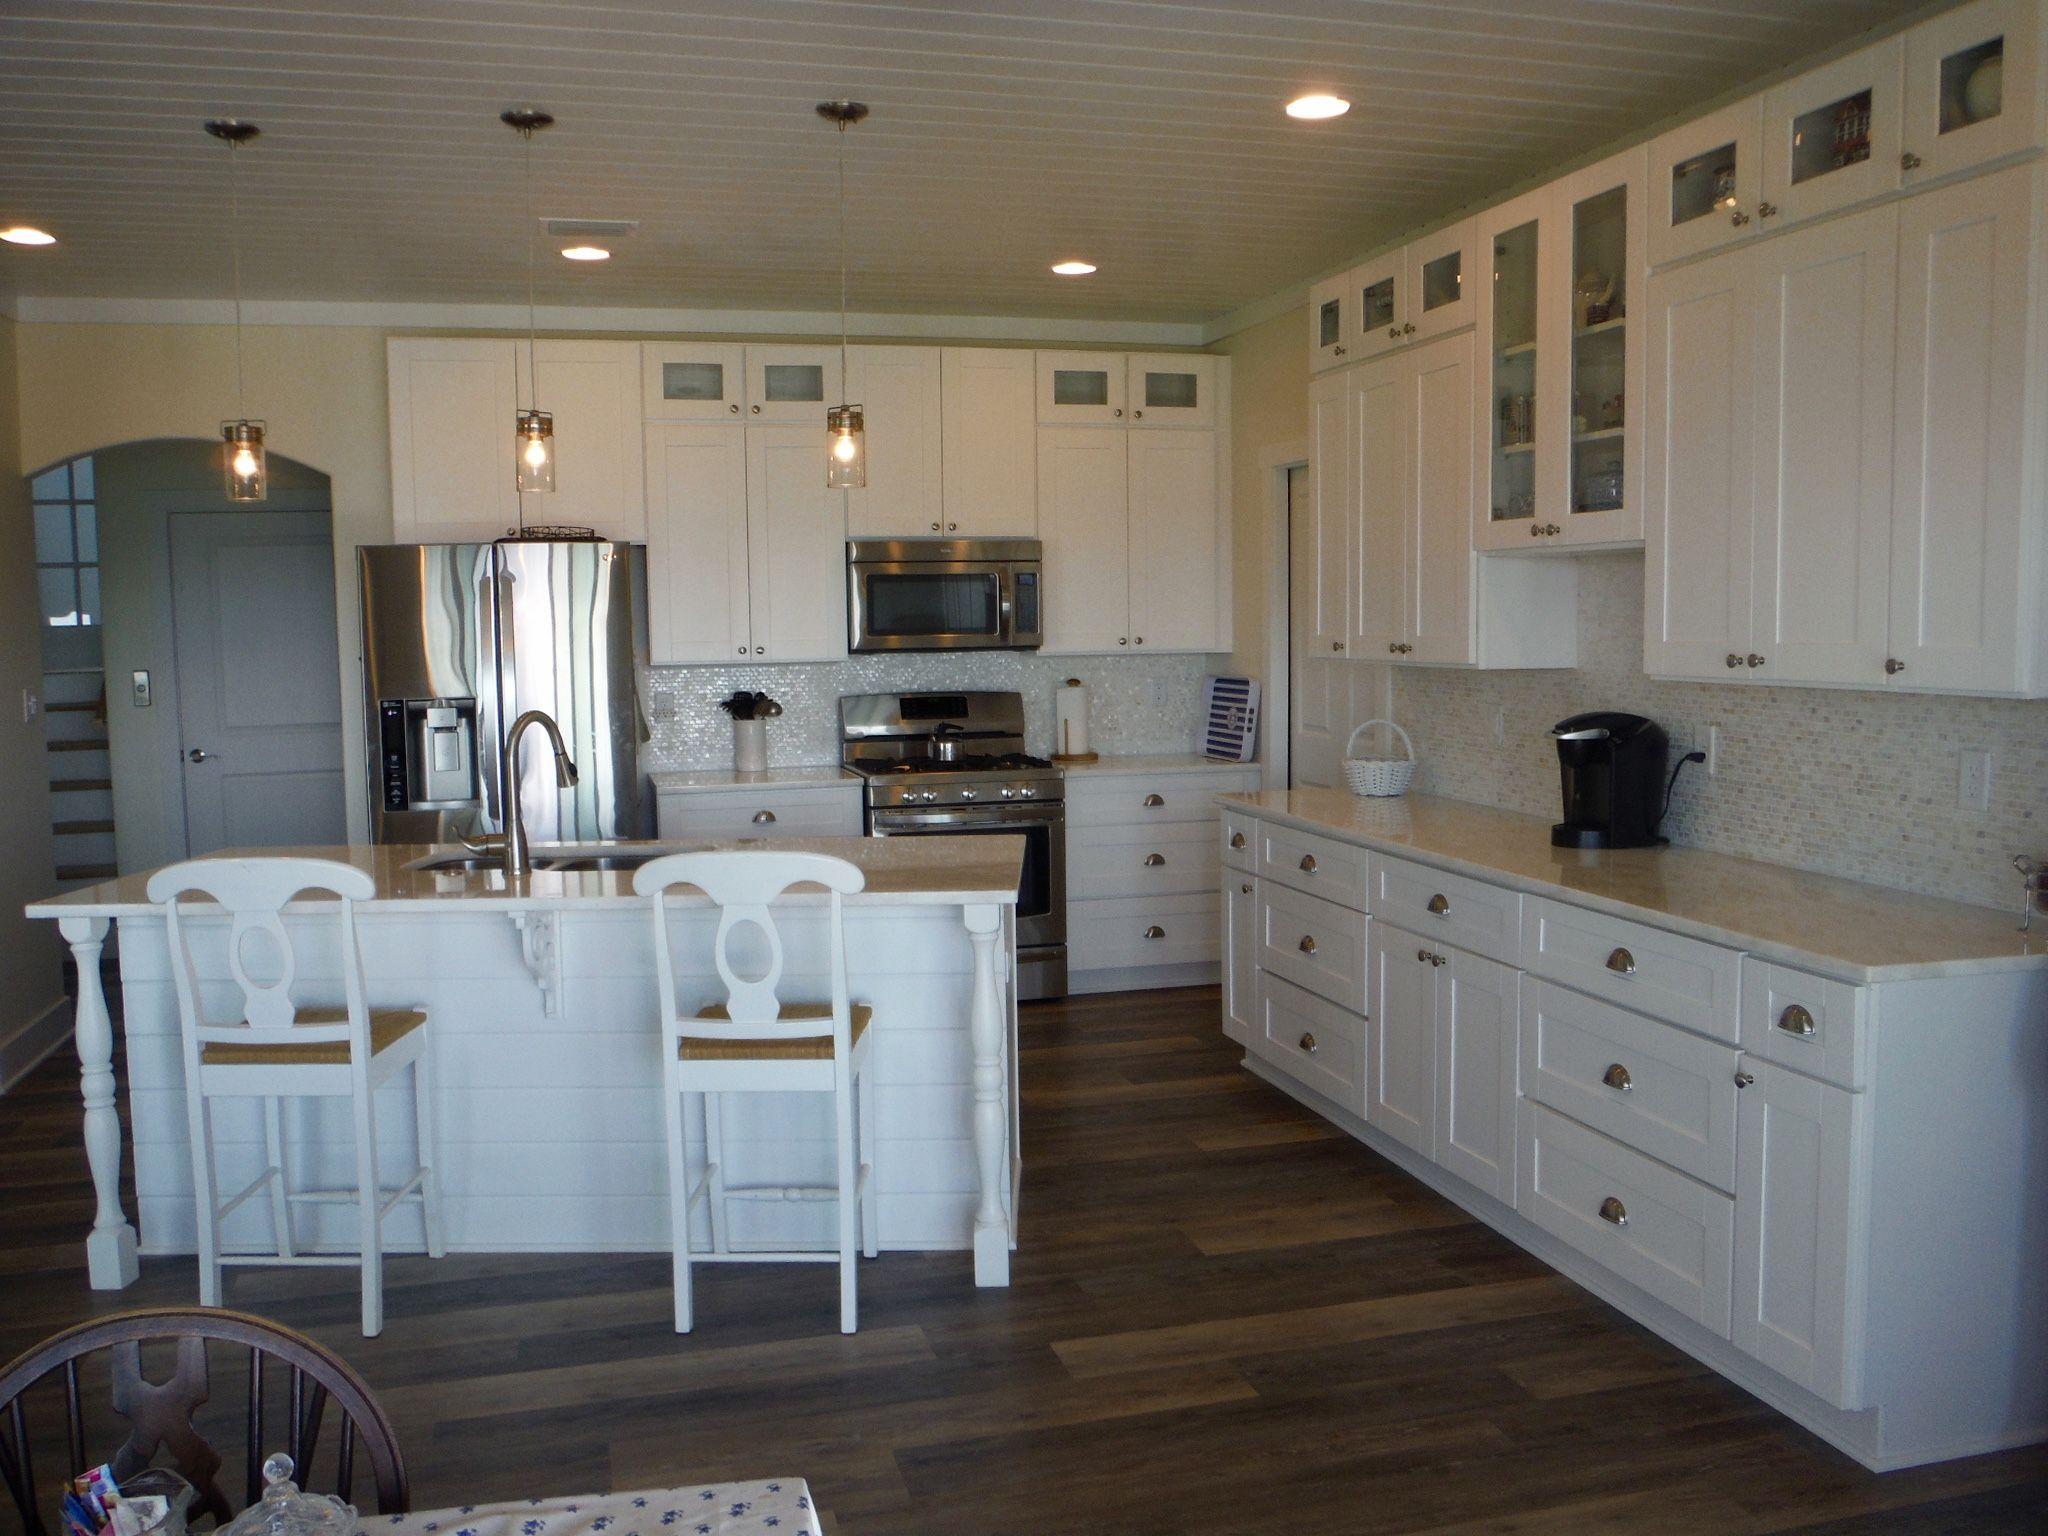 lily ann kitchen cabinets sale marvelous interior images of homes u2022 rh districhem co